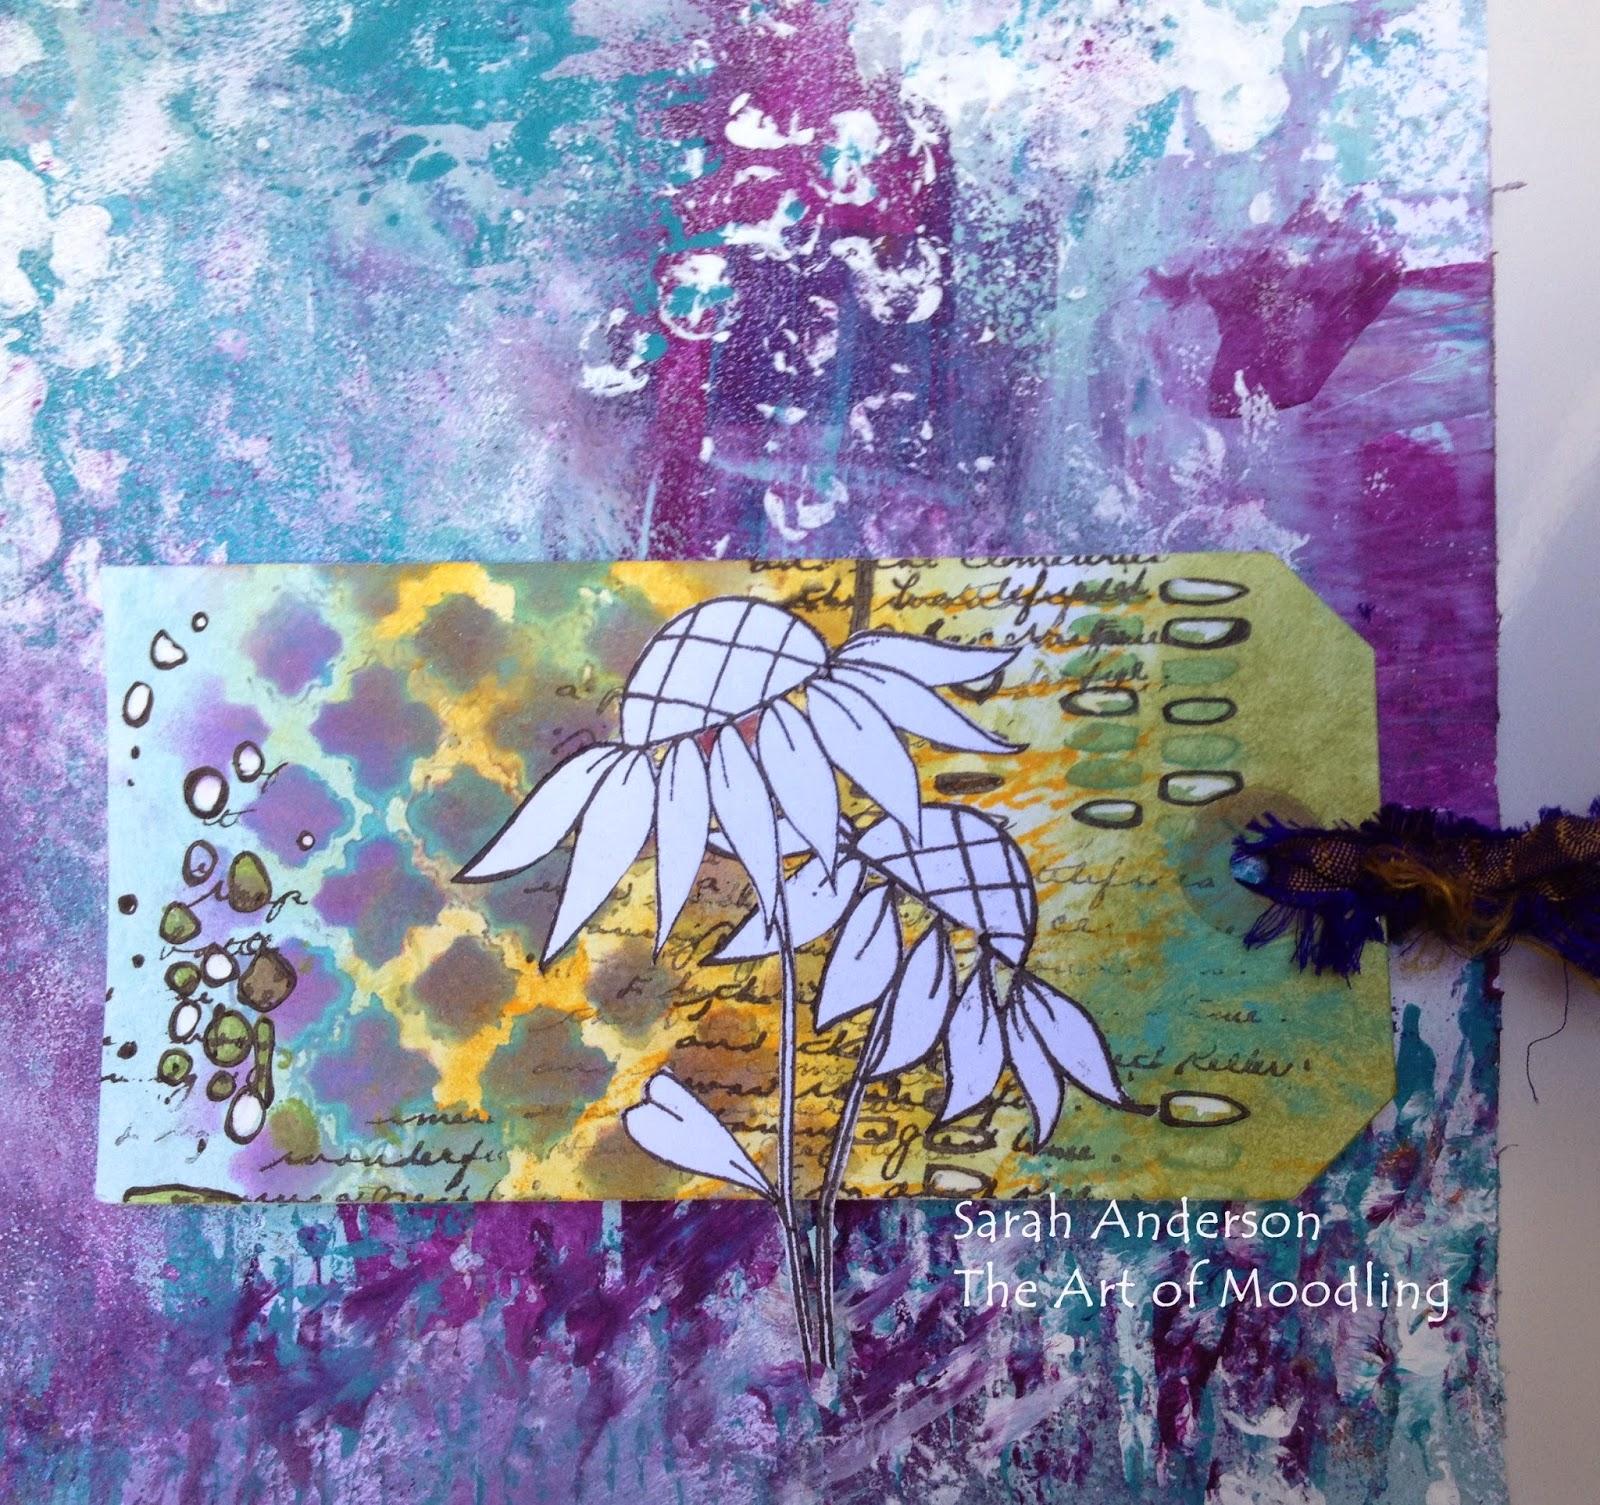 stencilled tag